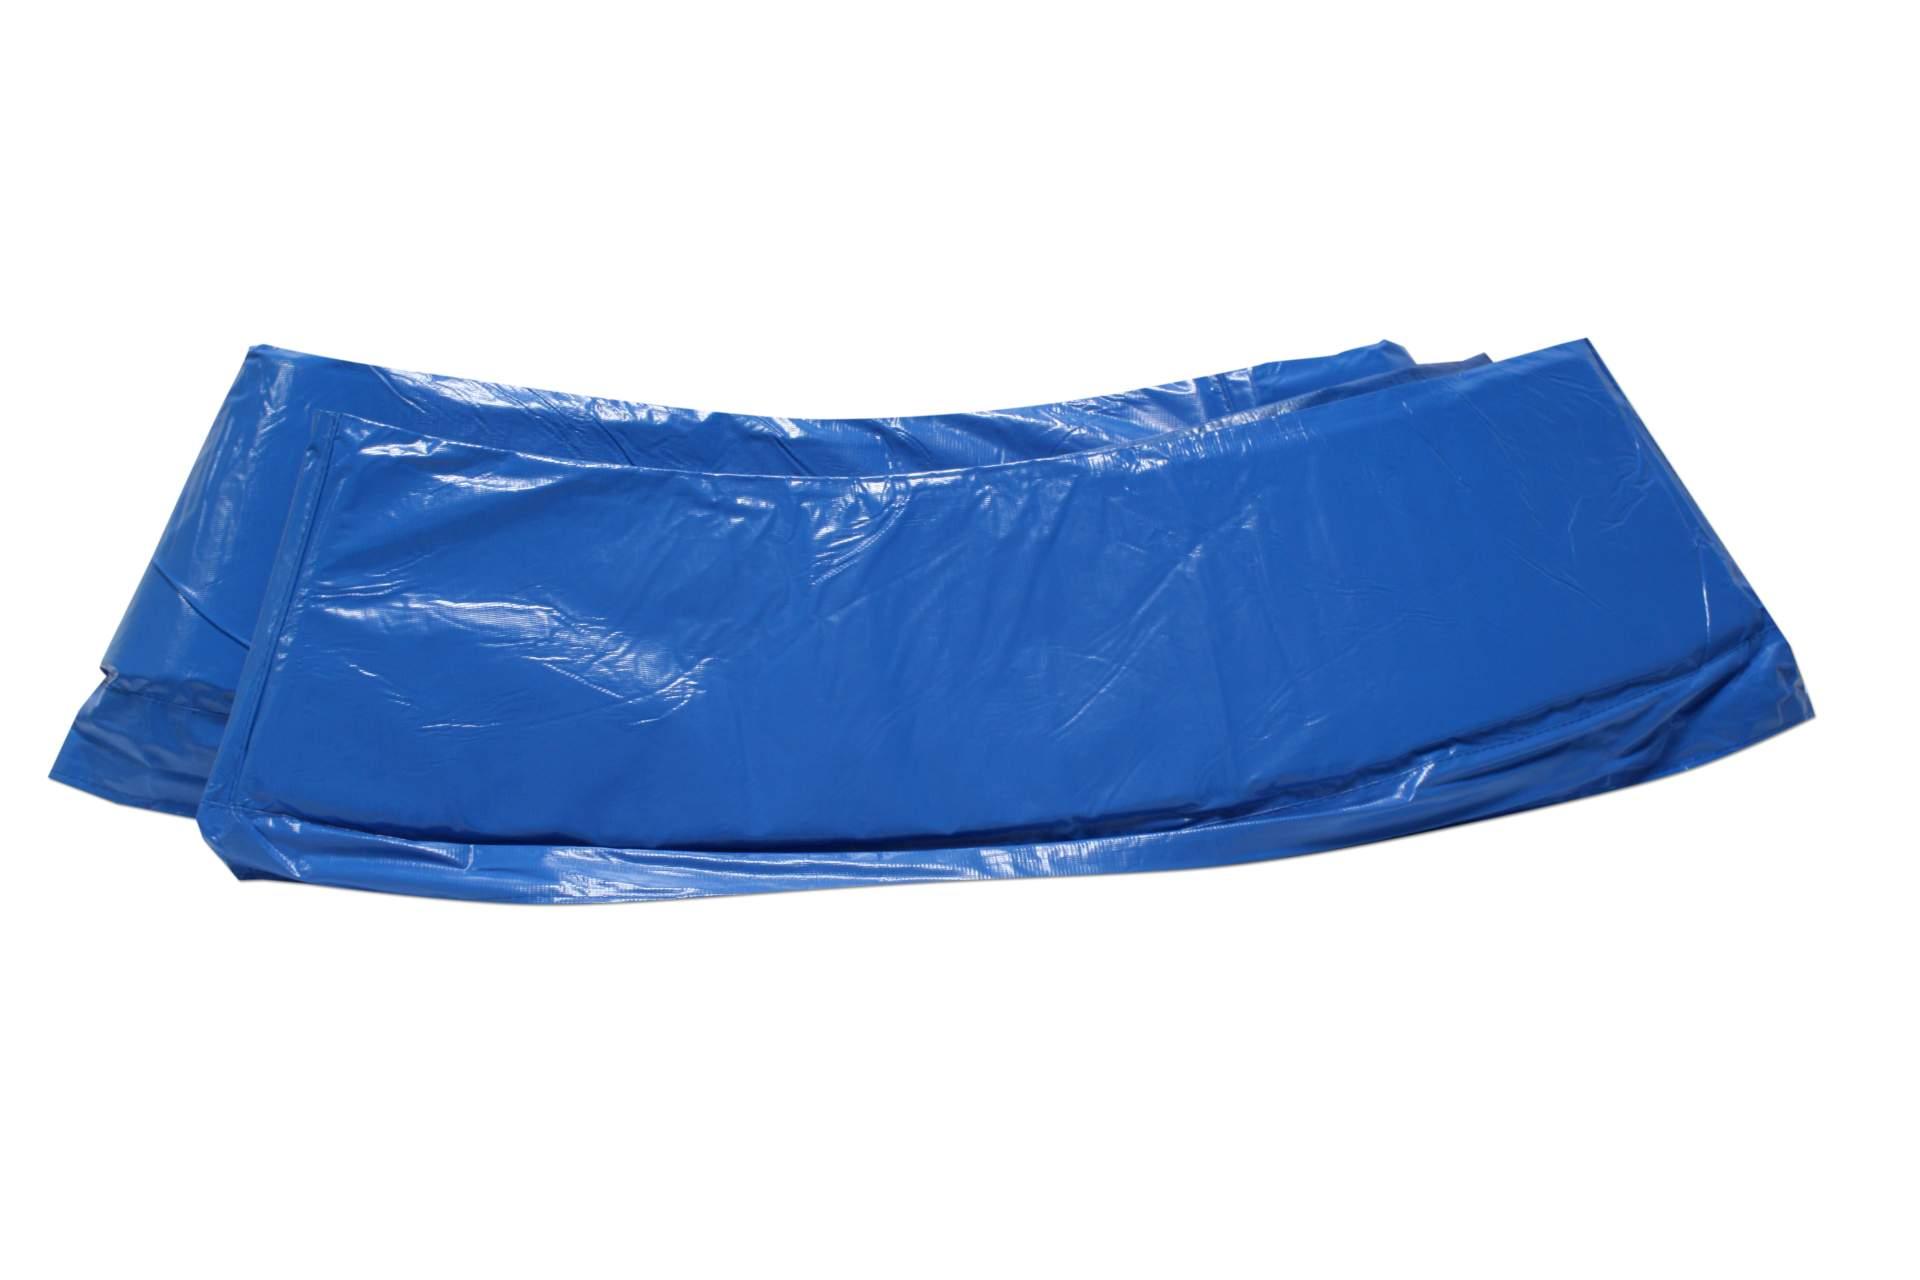 trampolin randabdeckung 305 cm feder abdeckung blau 10 ft pvc federabdeckung neu ebay. Black Bedroom Furniture Sets. Home Design Ideas